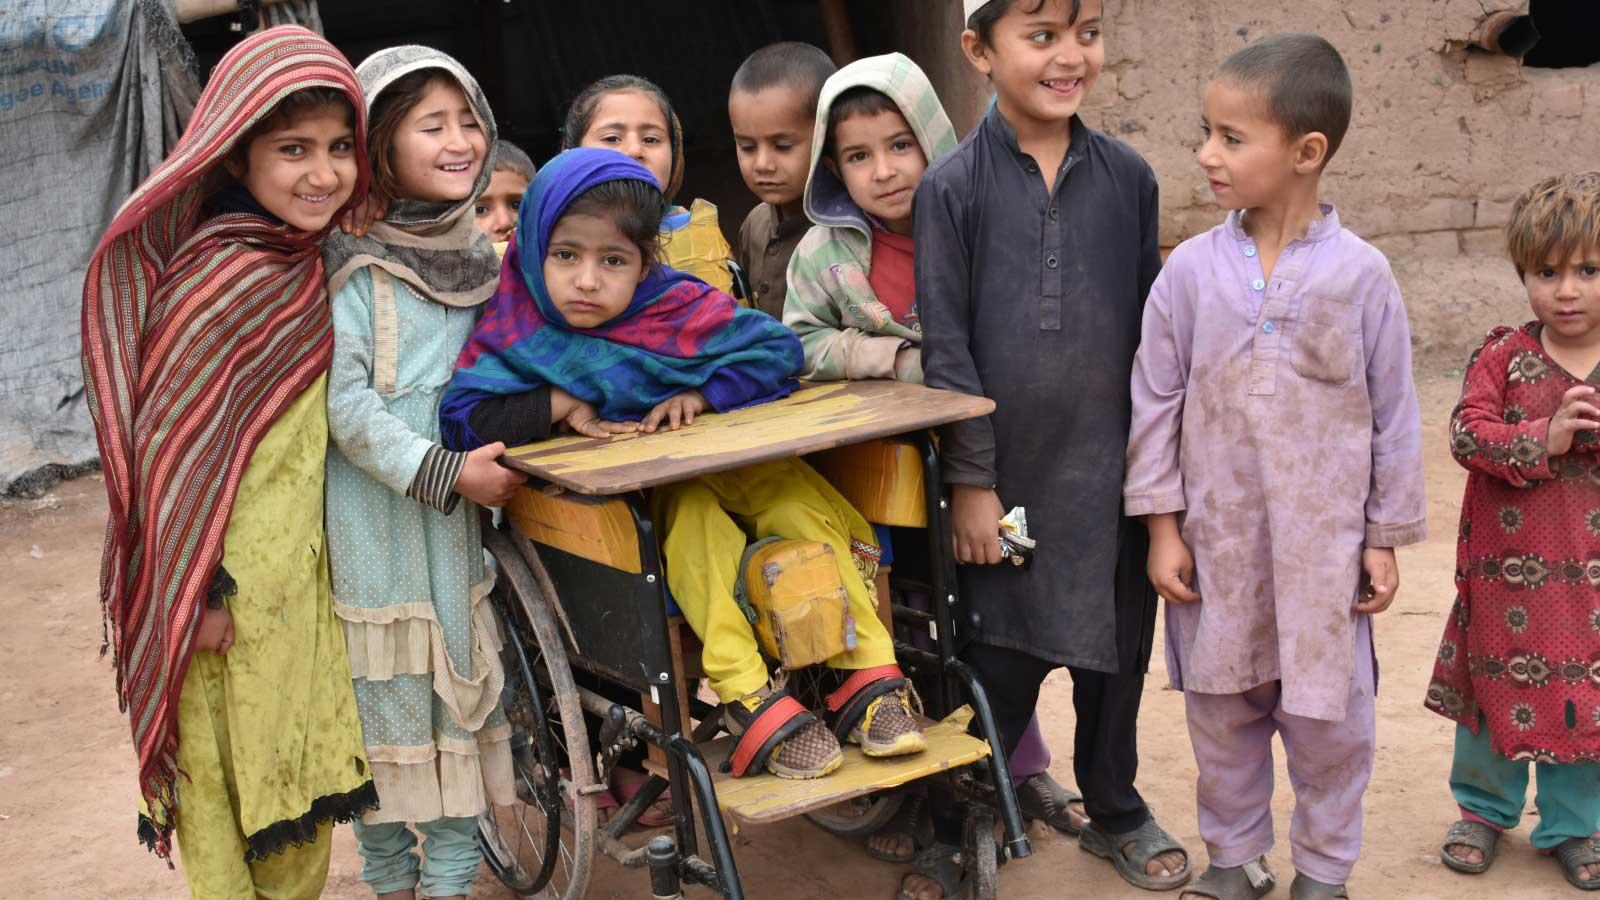 COVID-19 in Pakistan | Quarantine isolates children with disabilities